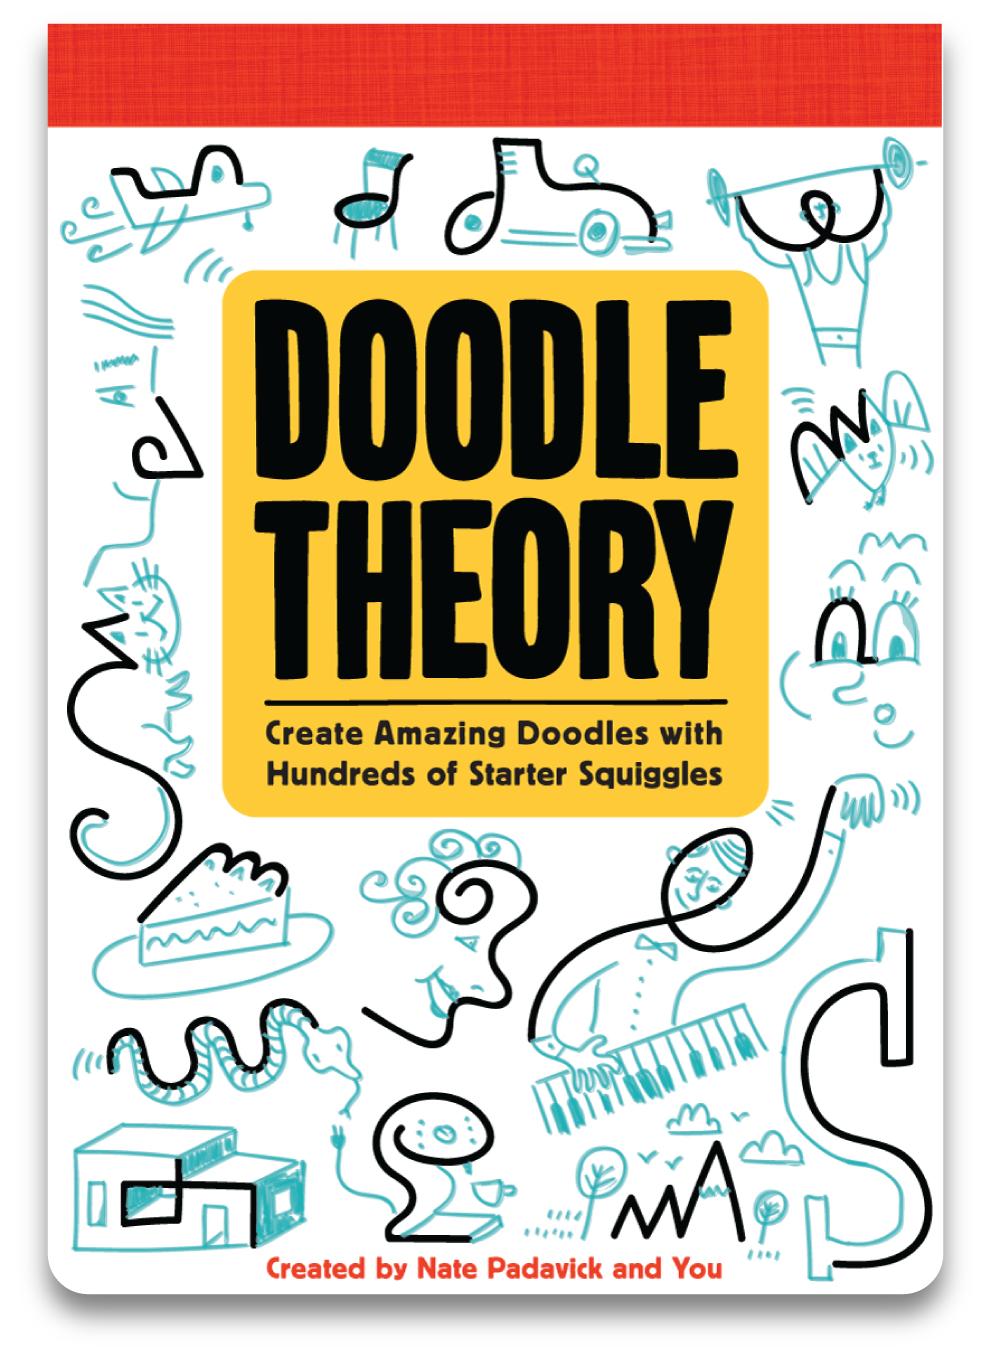 Doodle Theory by Nate Padavick